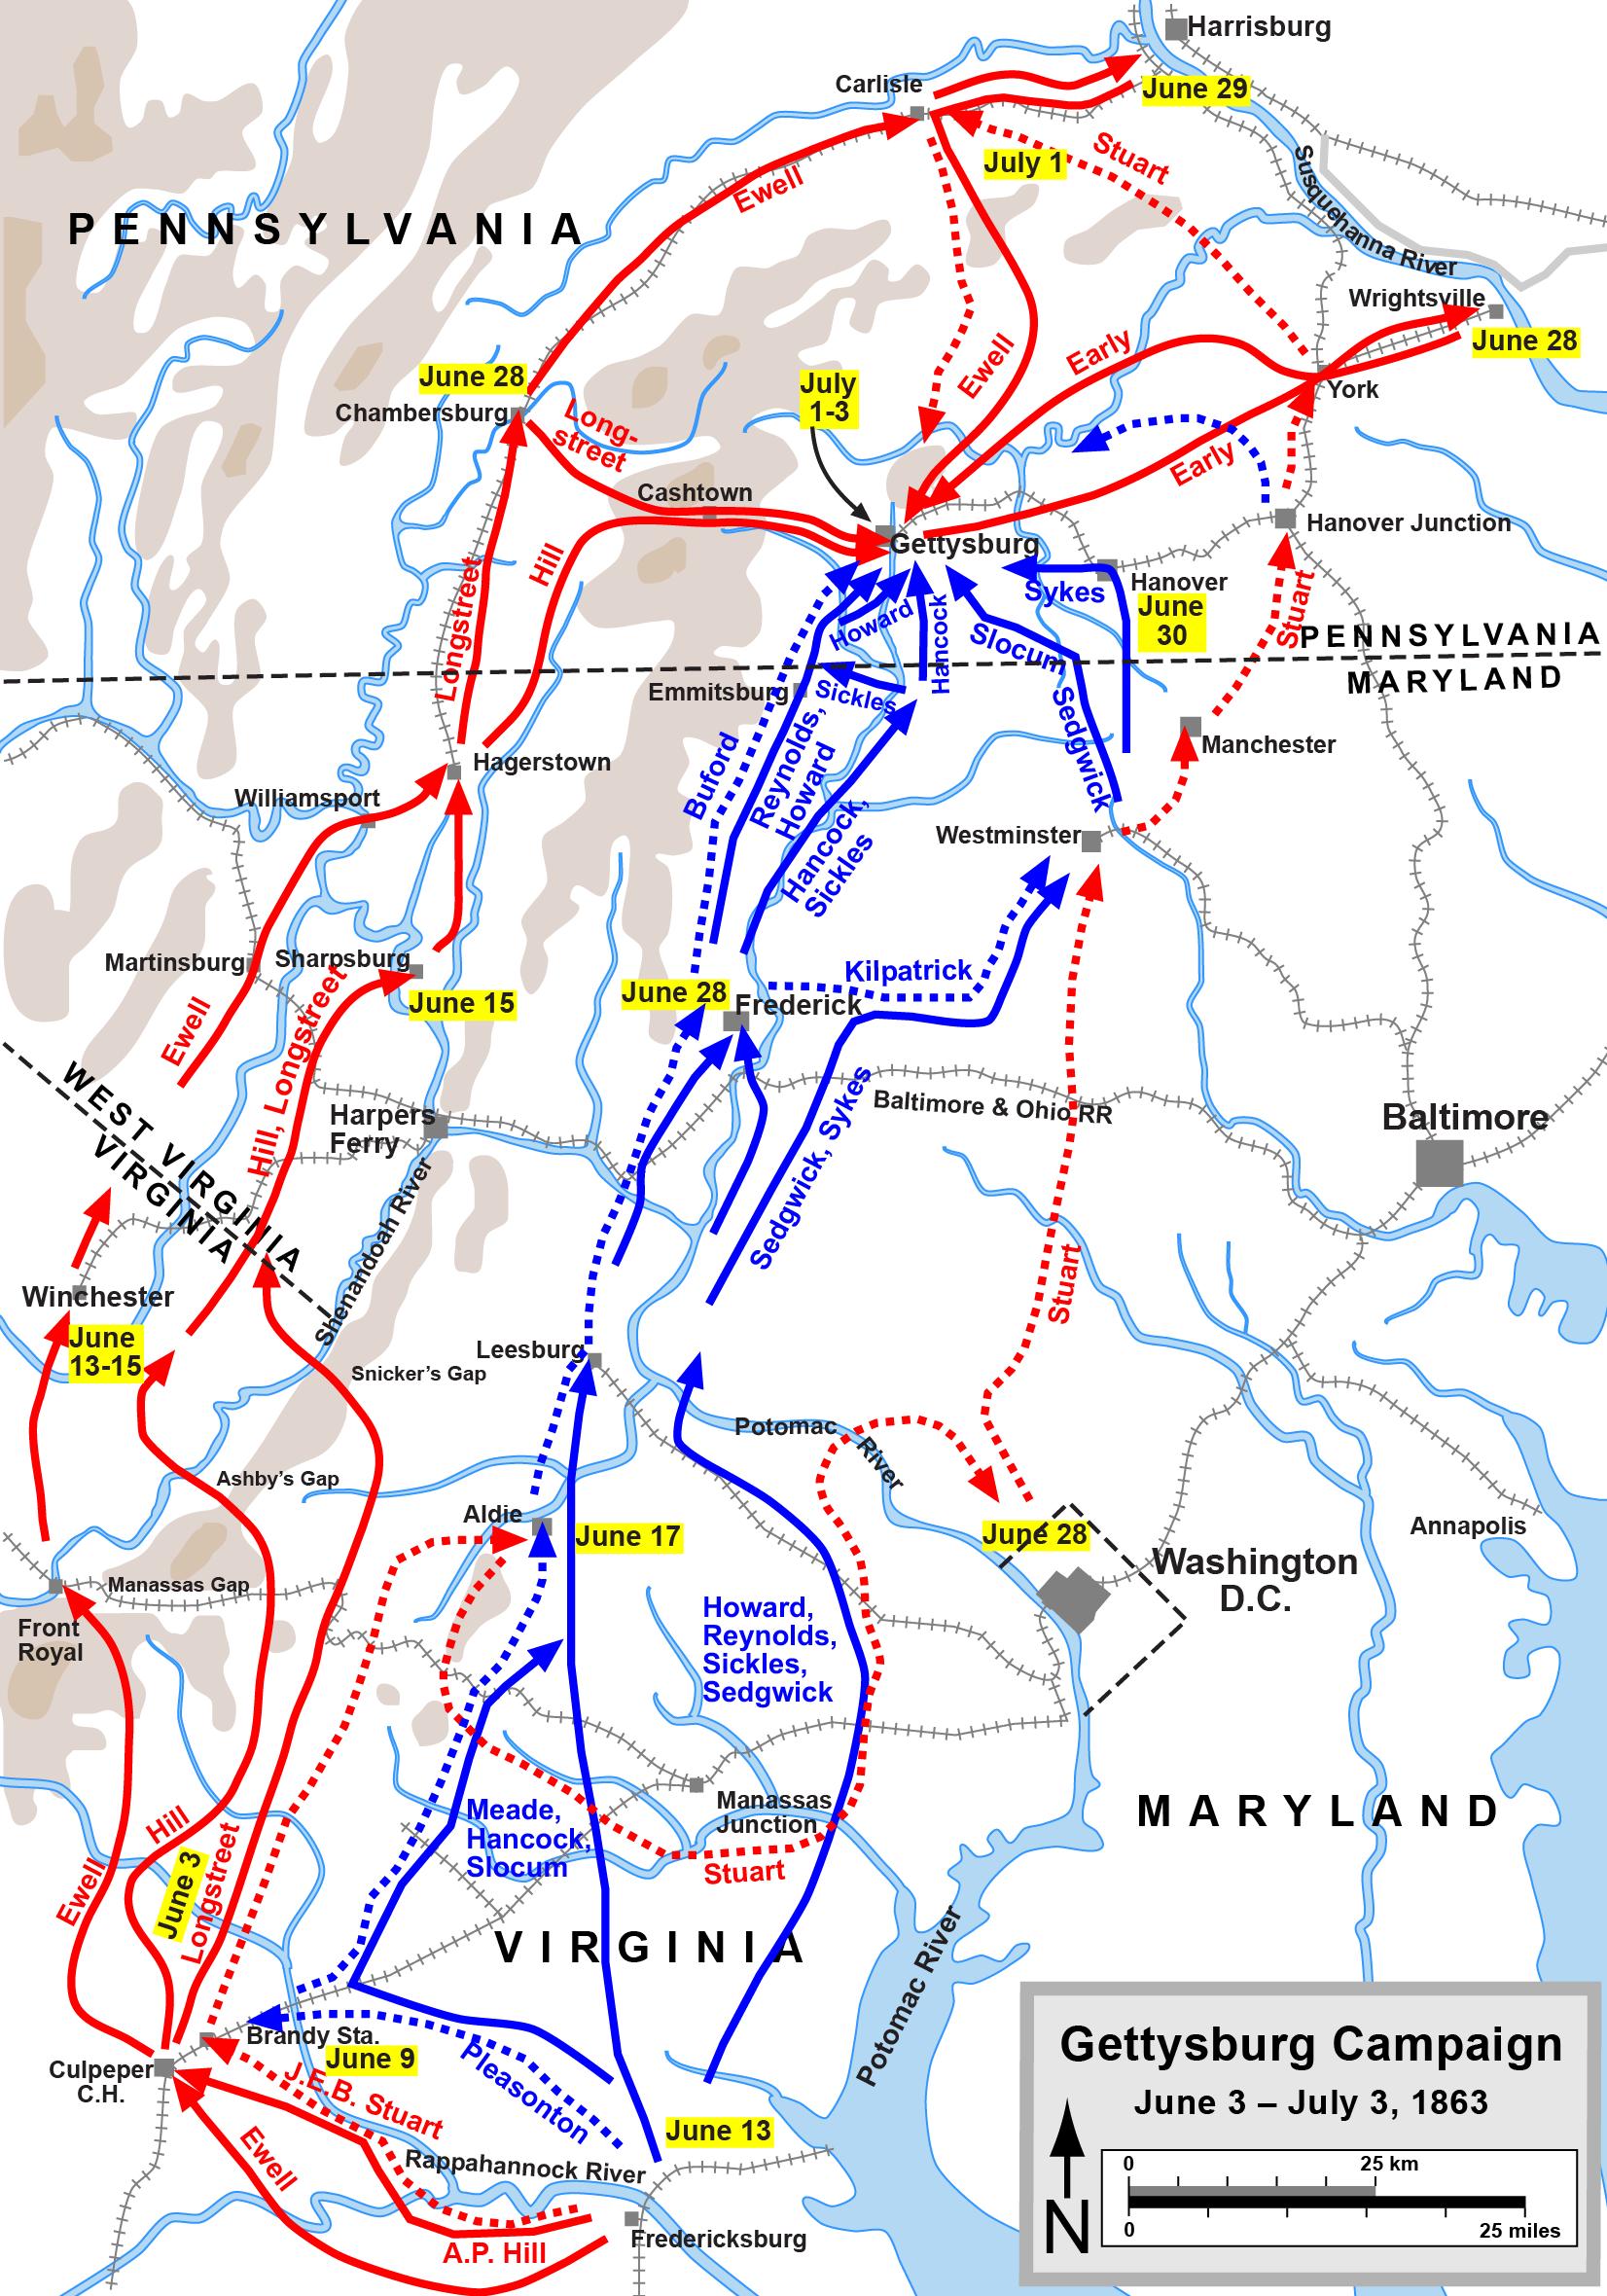 Maps That Explain The American Civil War Civil Wars American - Battle of gettysburg us map